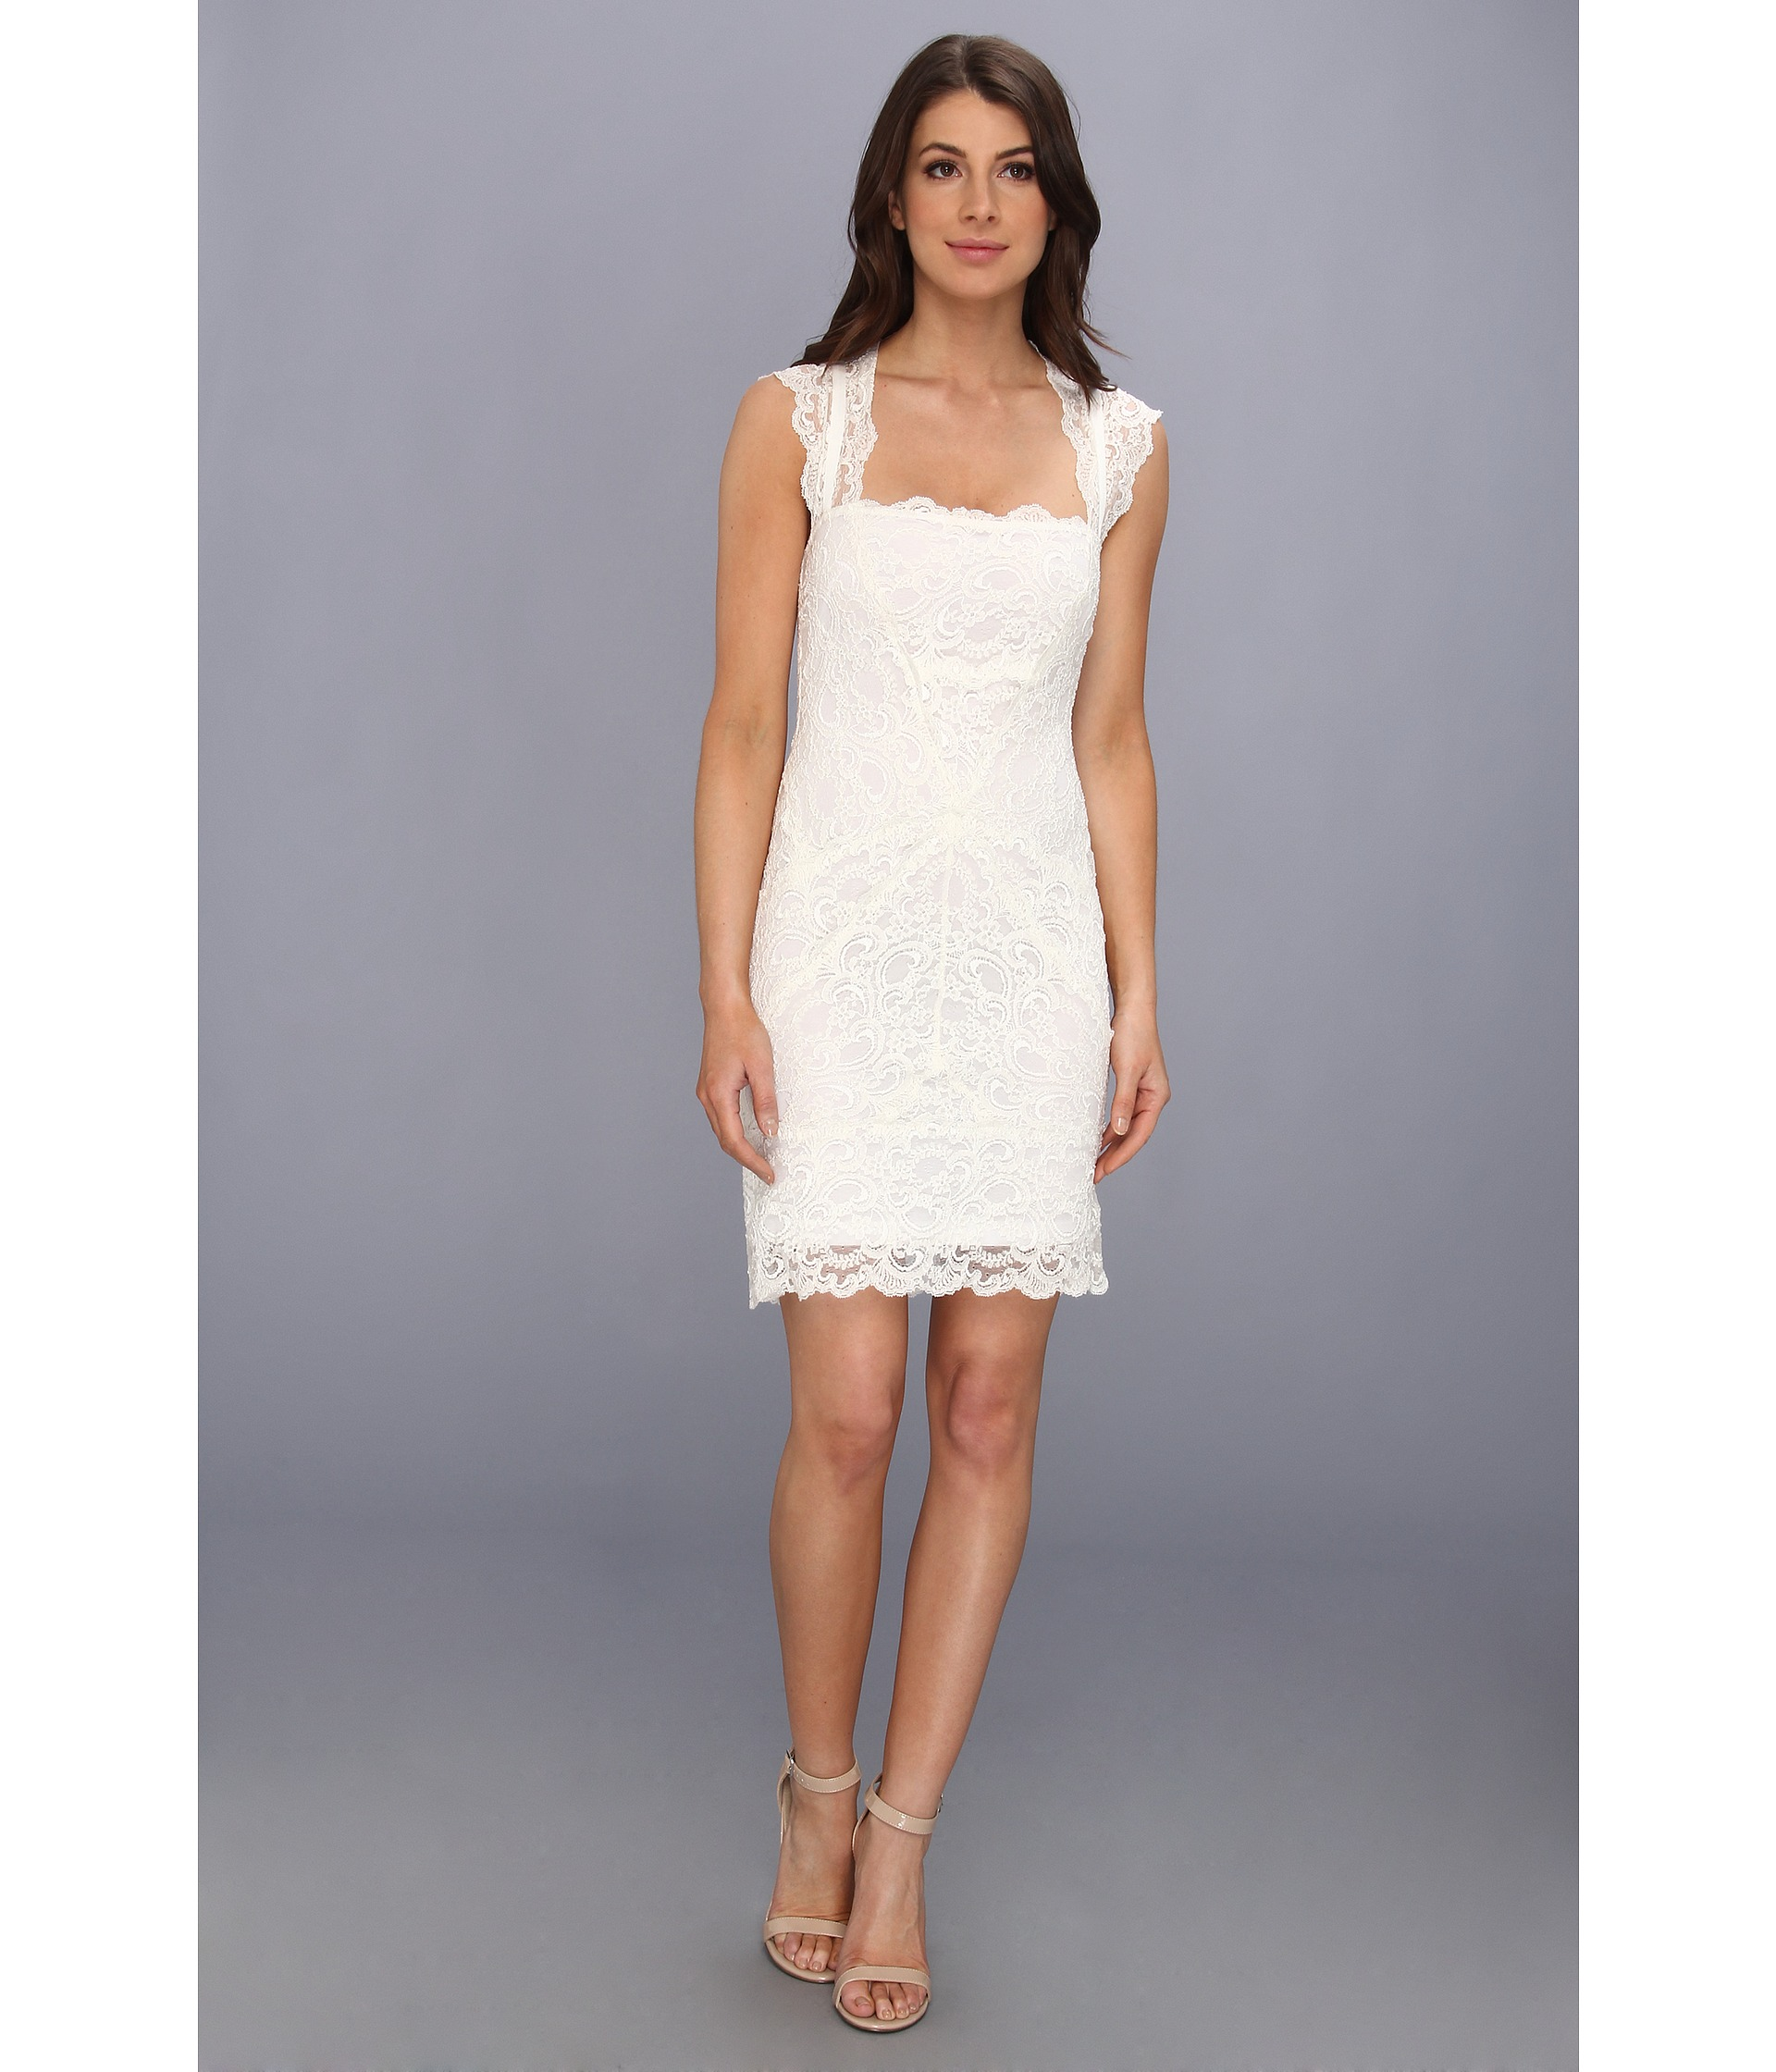 Dress $430.00 Nicole Miller Heavy Stretch Gown $377.99 $420.00 SALE